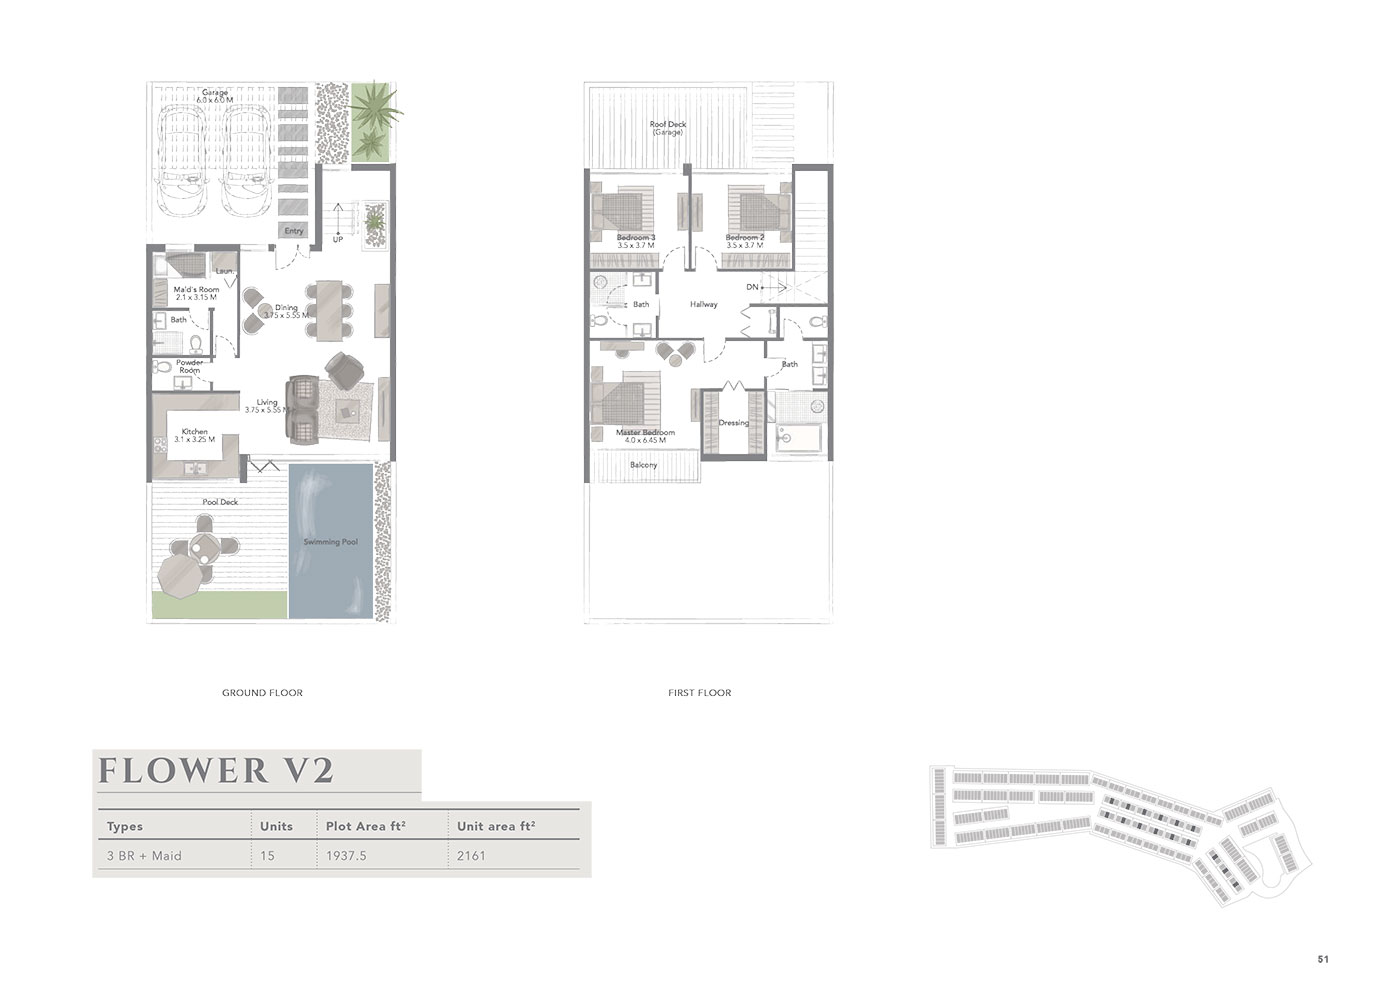 3 Bedroom +Maid, Flower V2,  Size 2161 sq ft